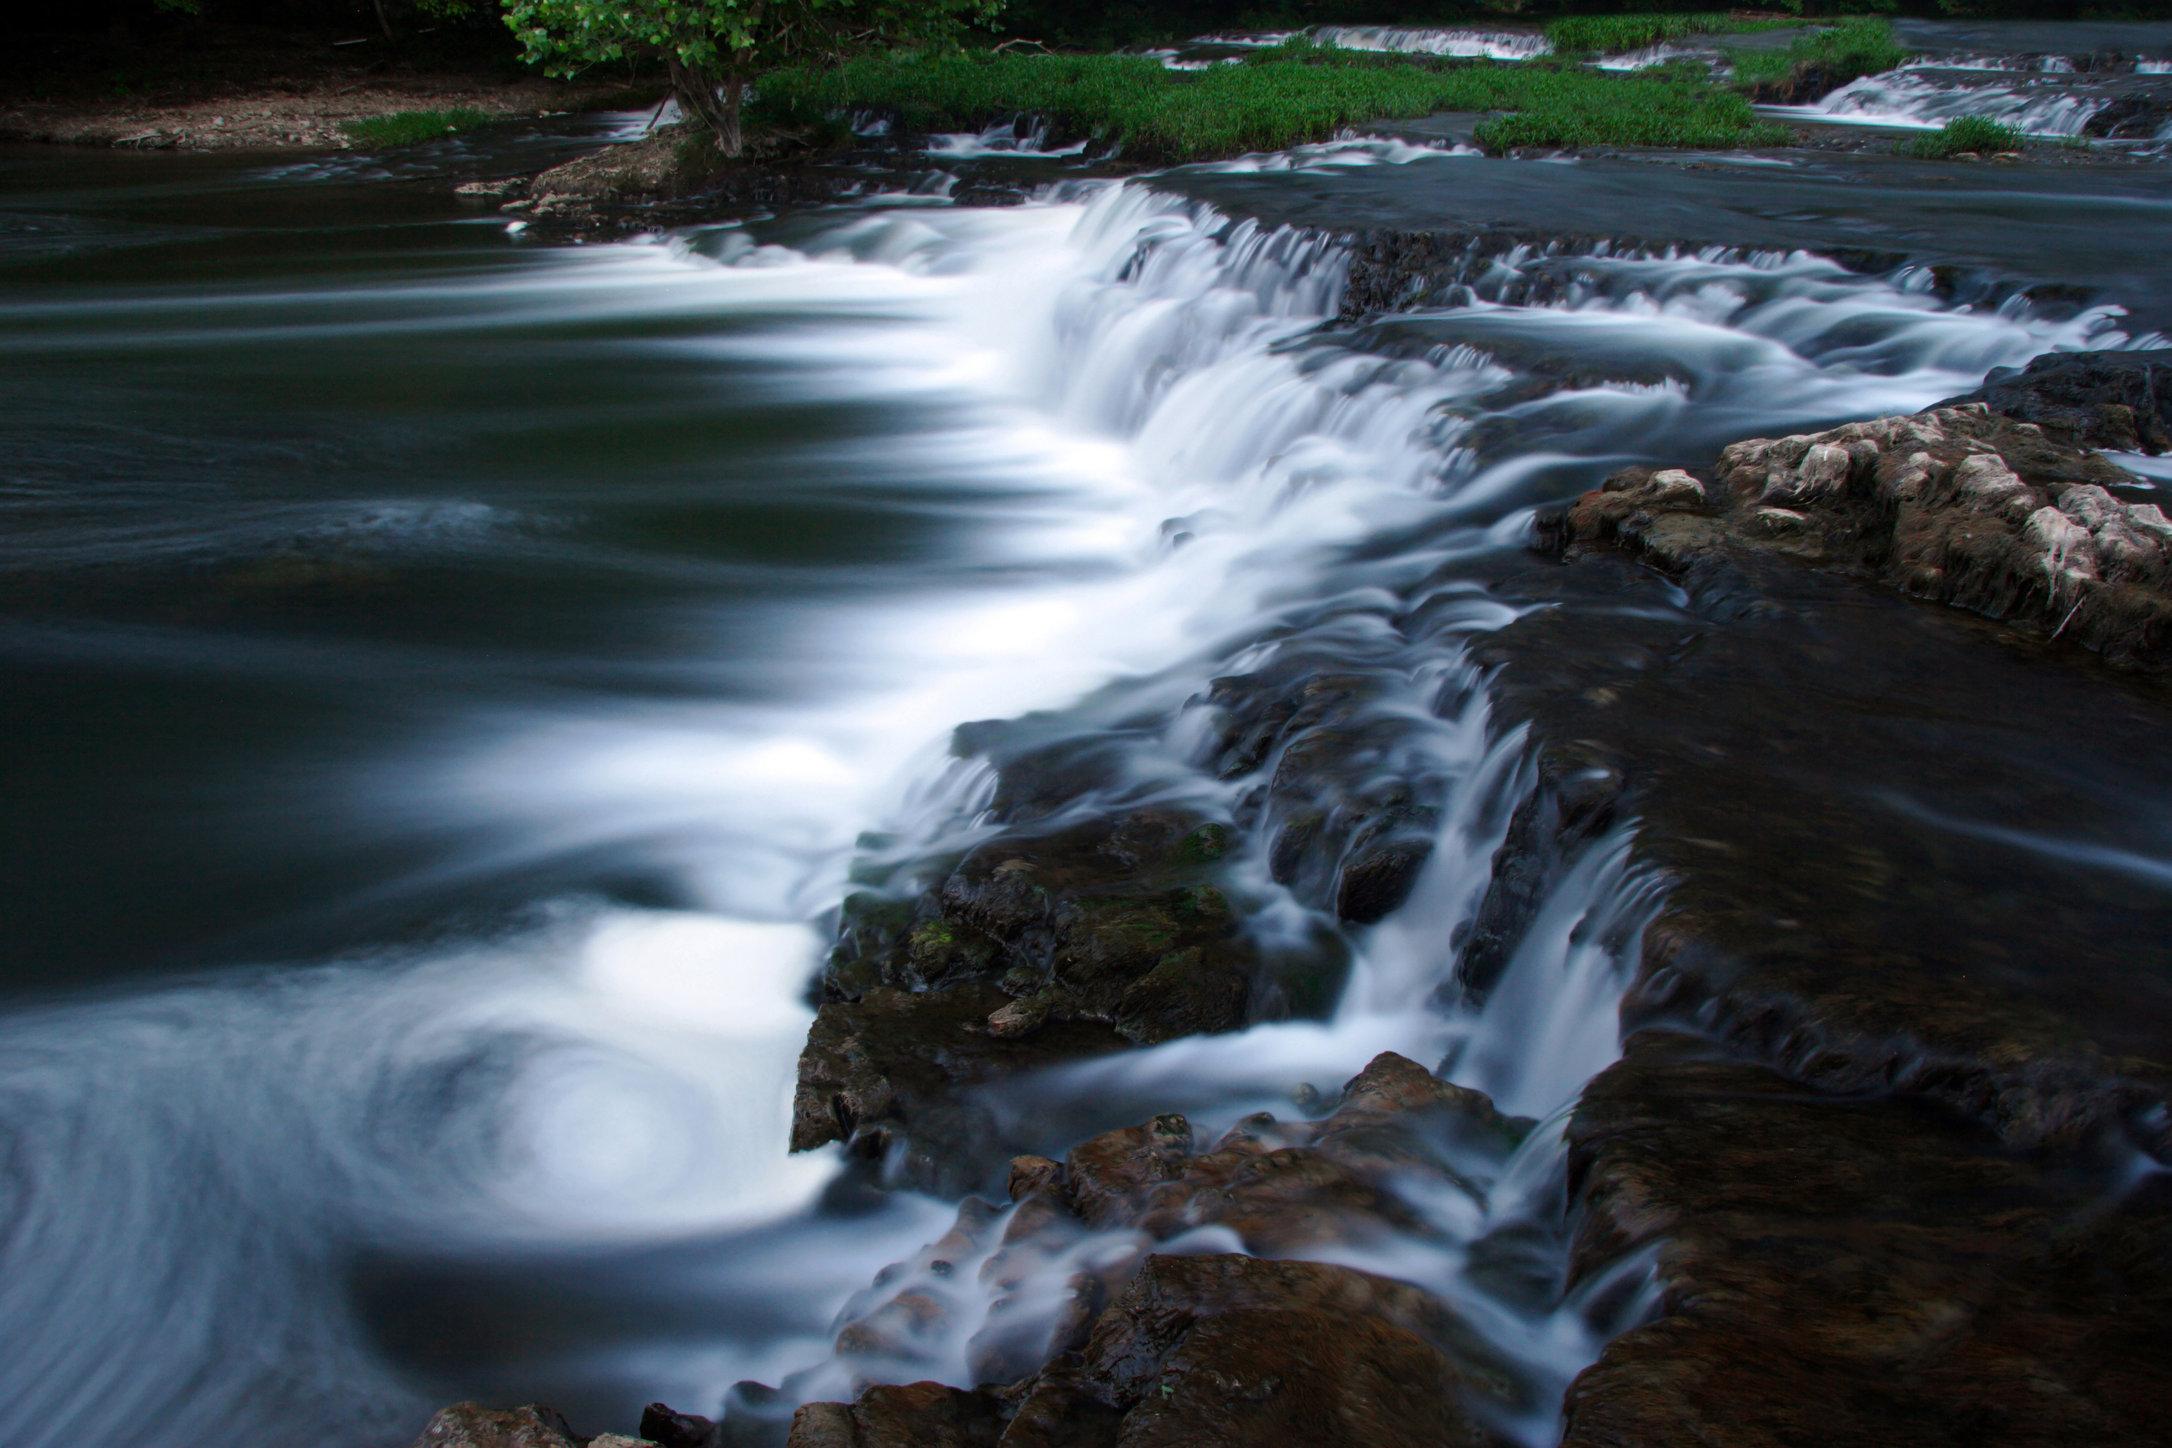 The Falls on Falls Road, Bainbridge, Ohio.